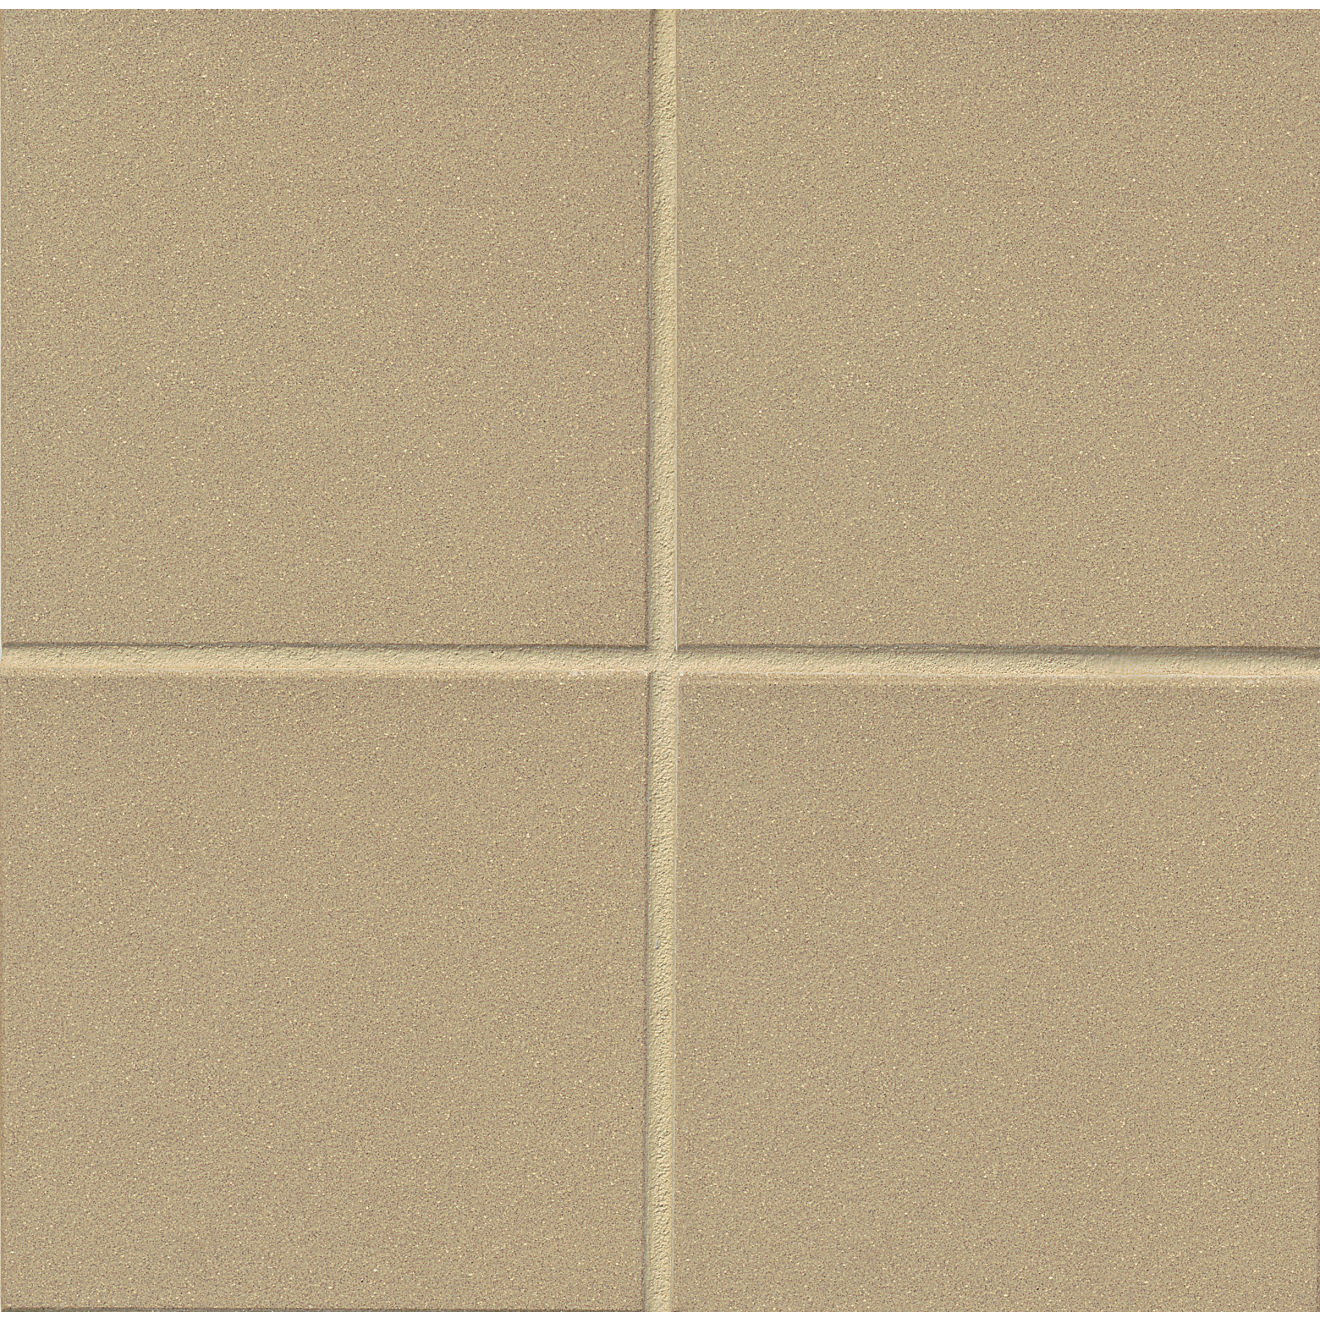 "Metropolitan 8"" x 8"" Floor & Wall Tile in Buckskin"